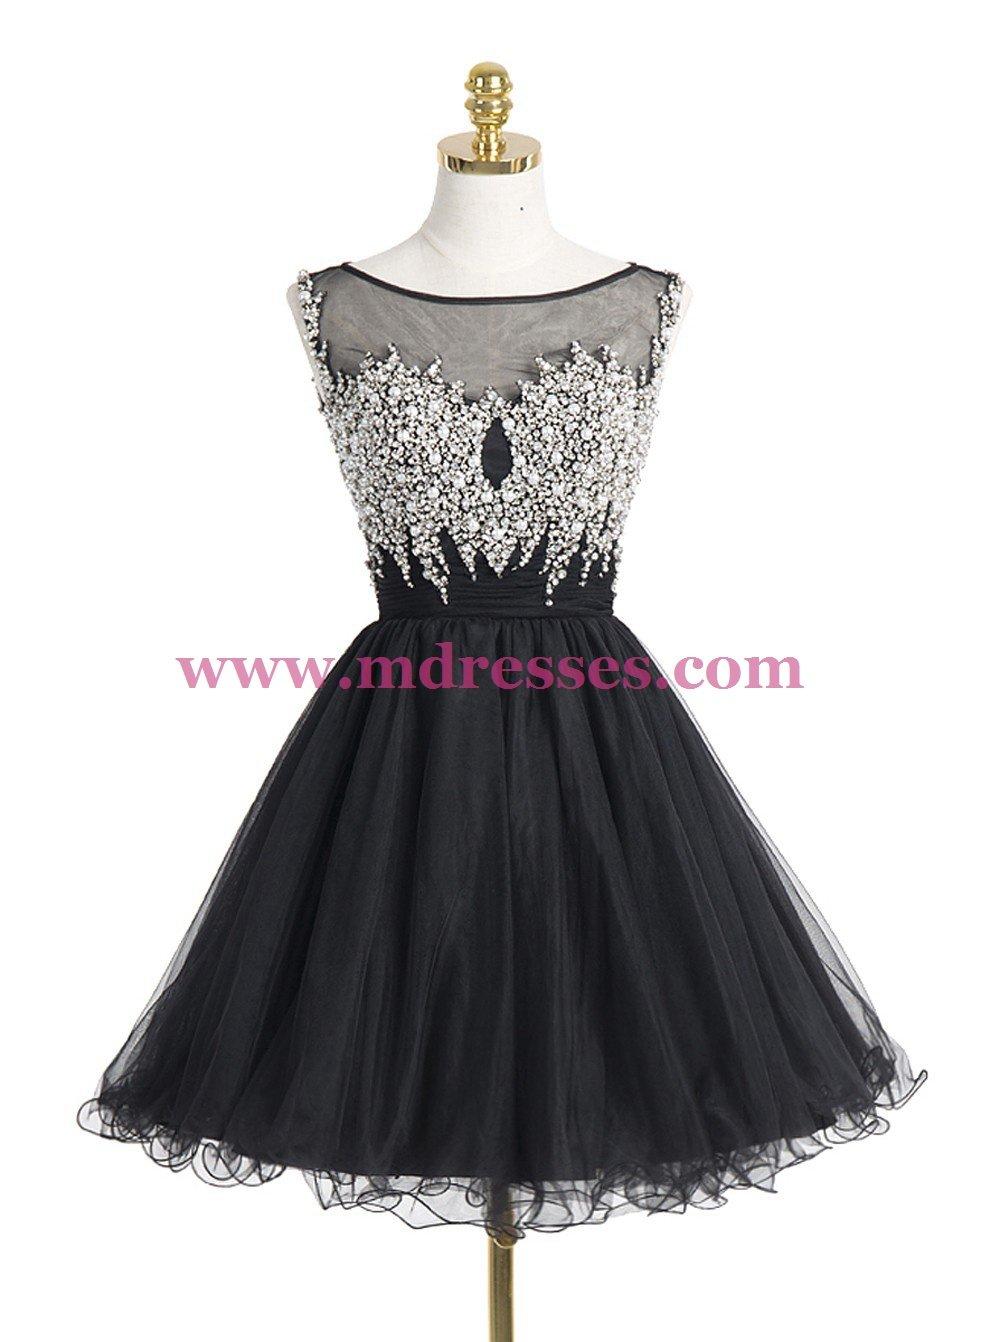 Short/Mini Illusion Neckline Beaded Black Homecoming Cocktail Prom Dresses 523